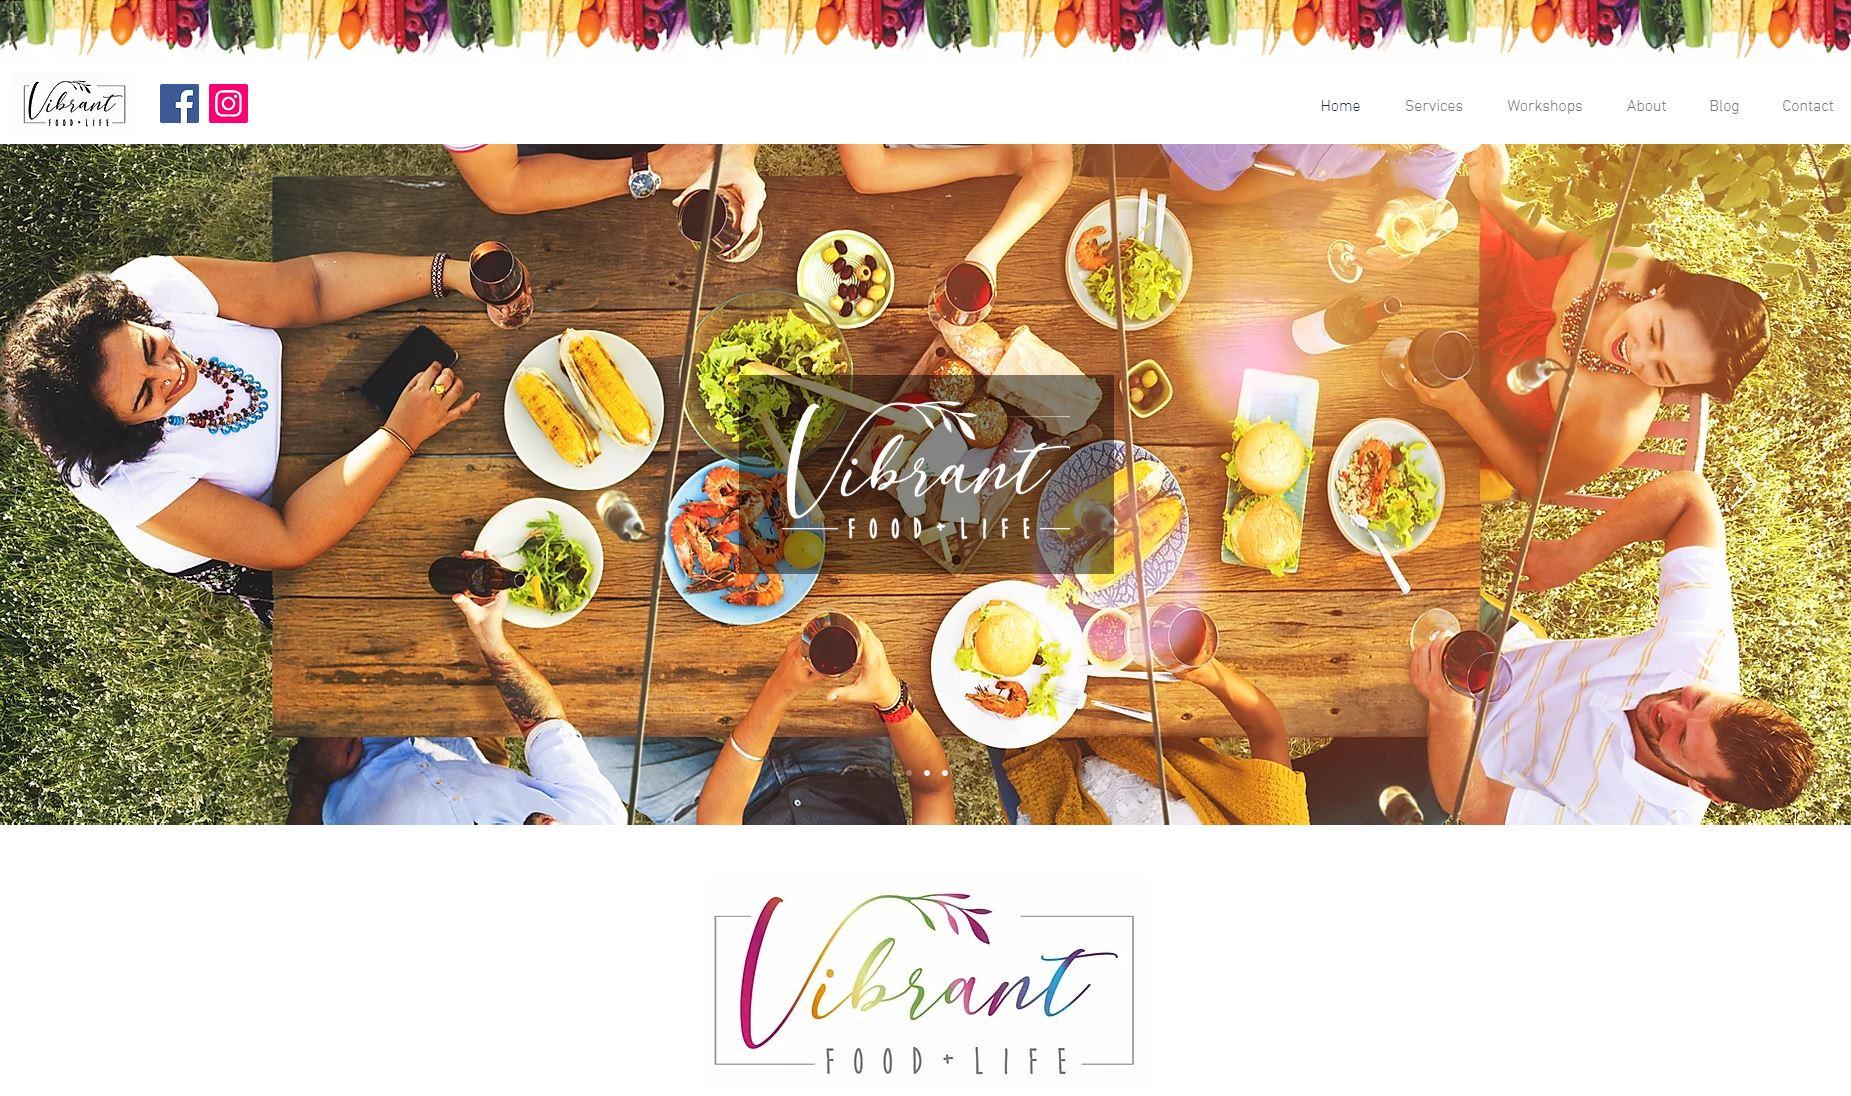 Vibrant Food Life